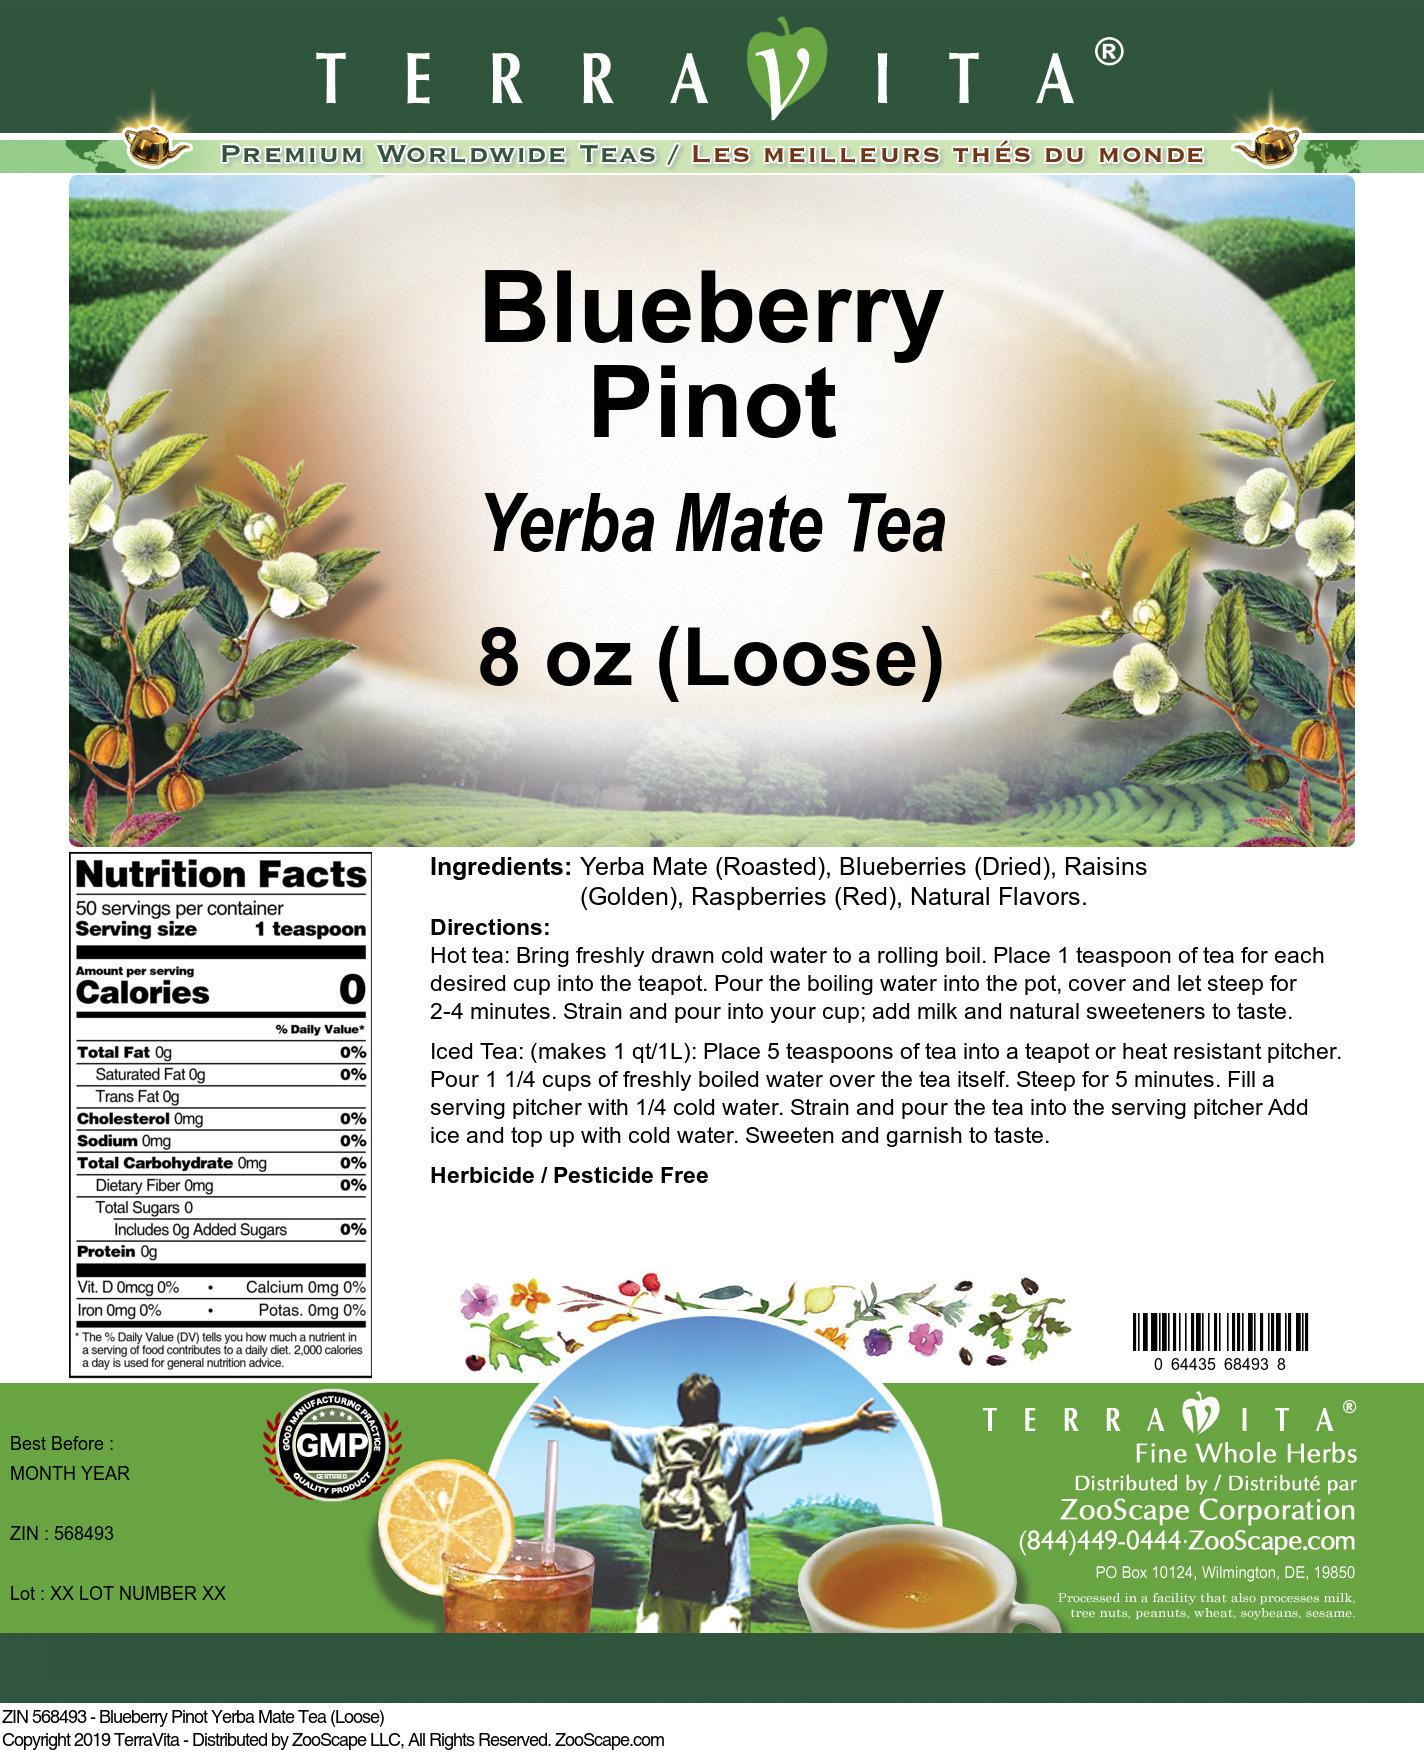 Blueberry Pinot Yerba Mate